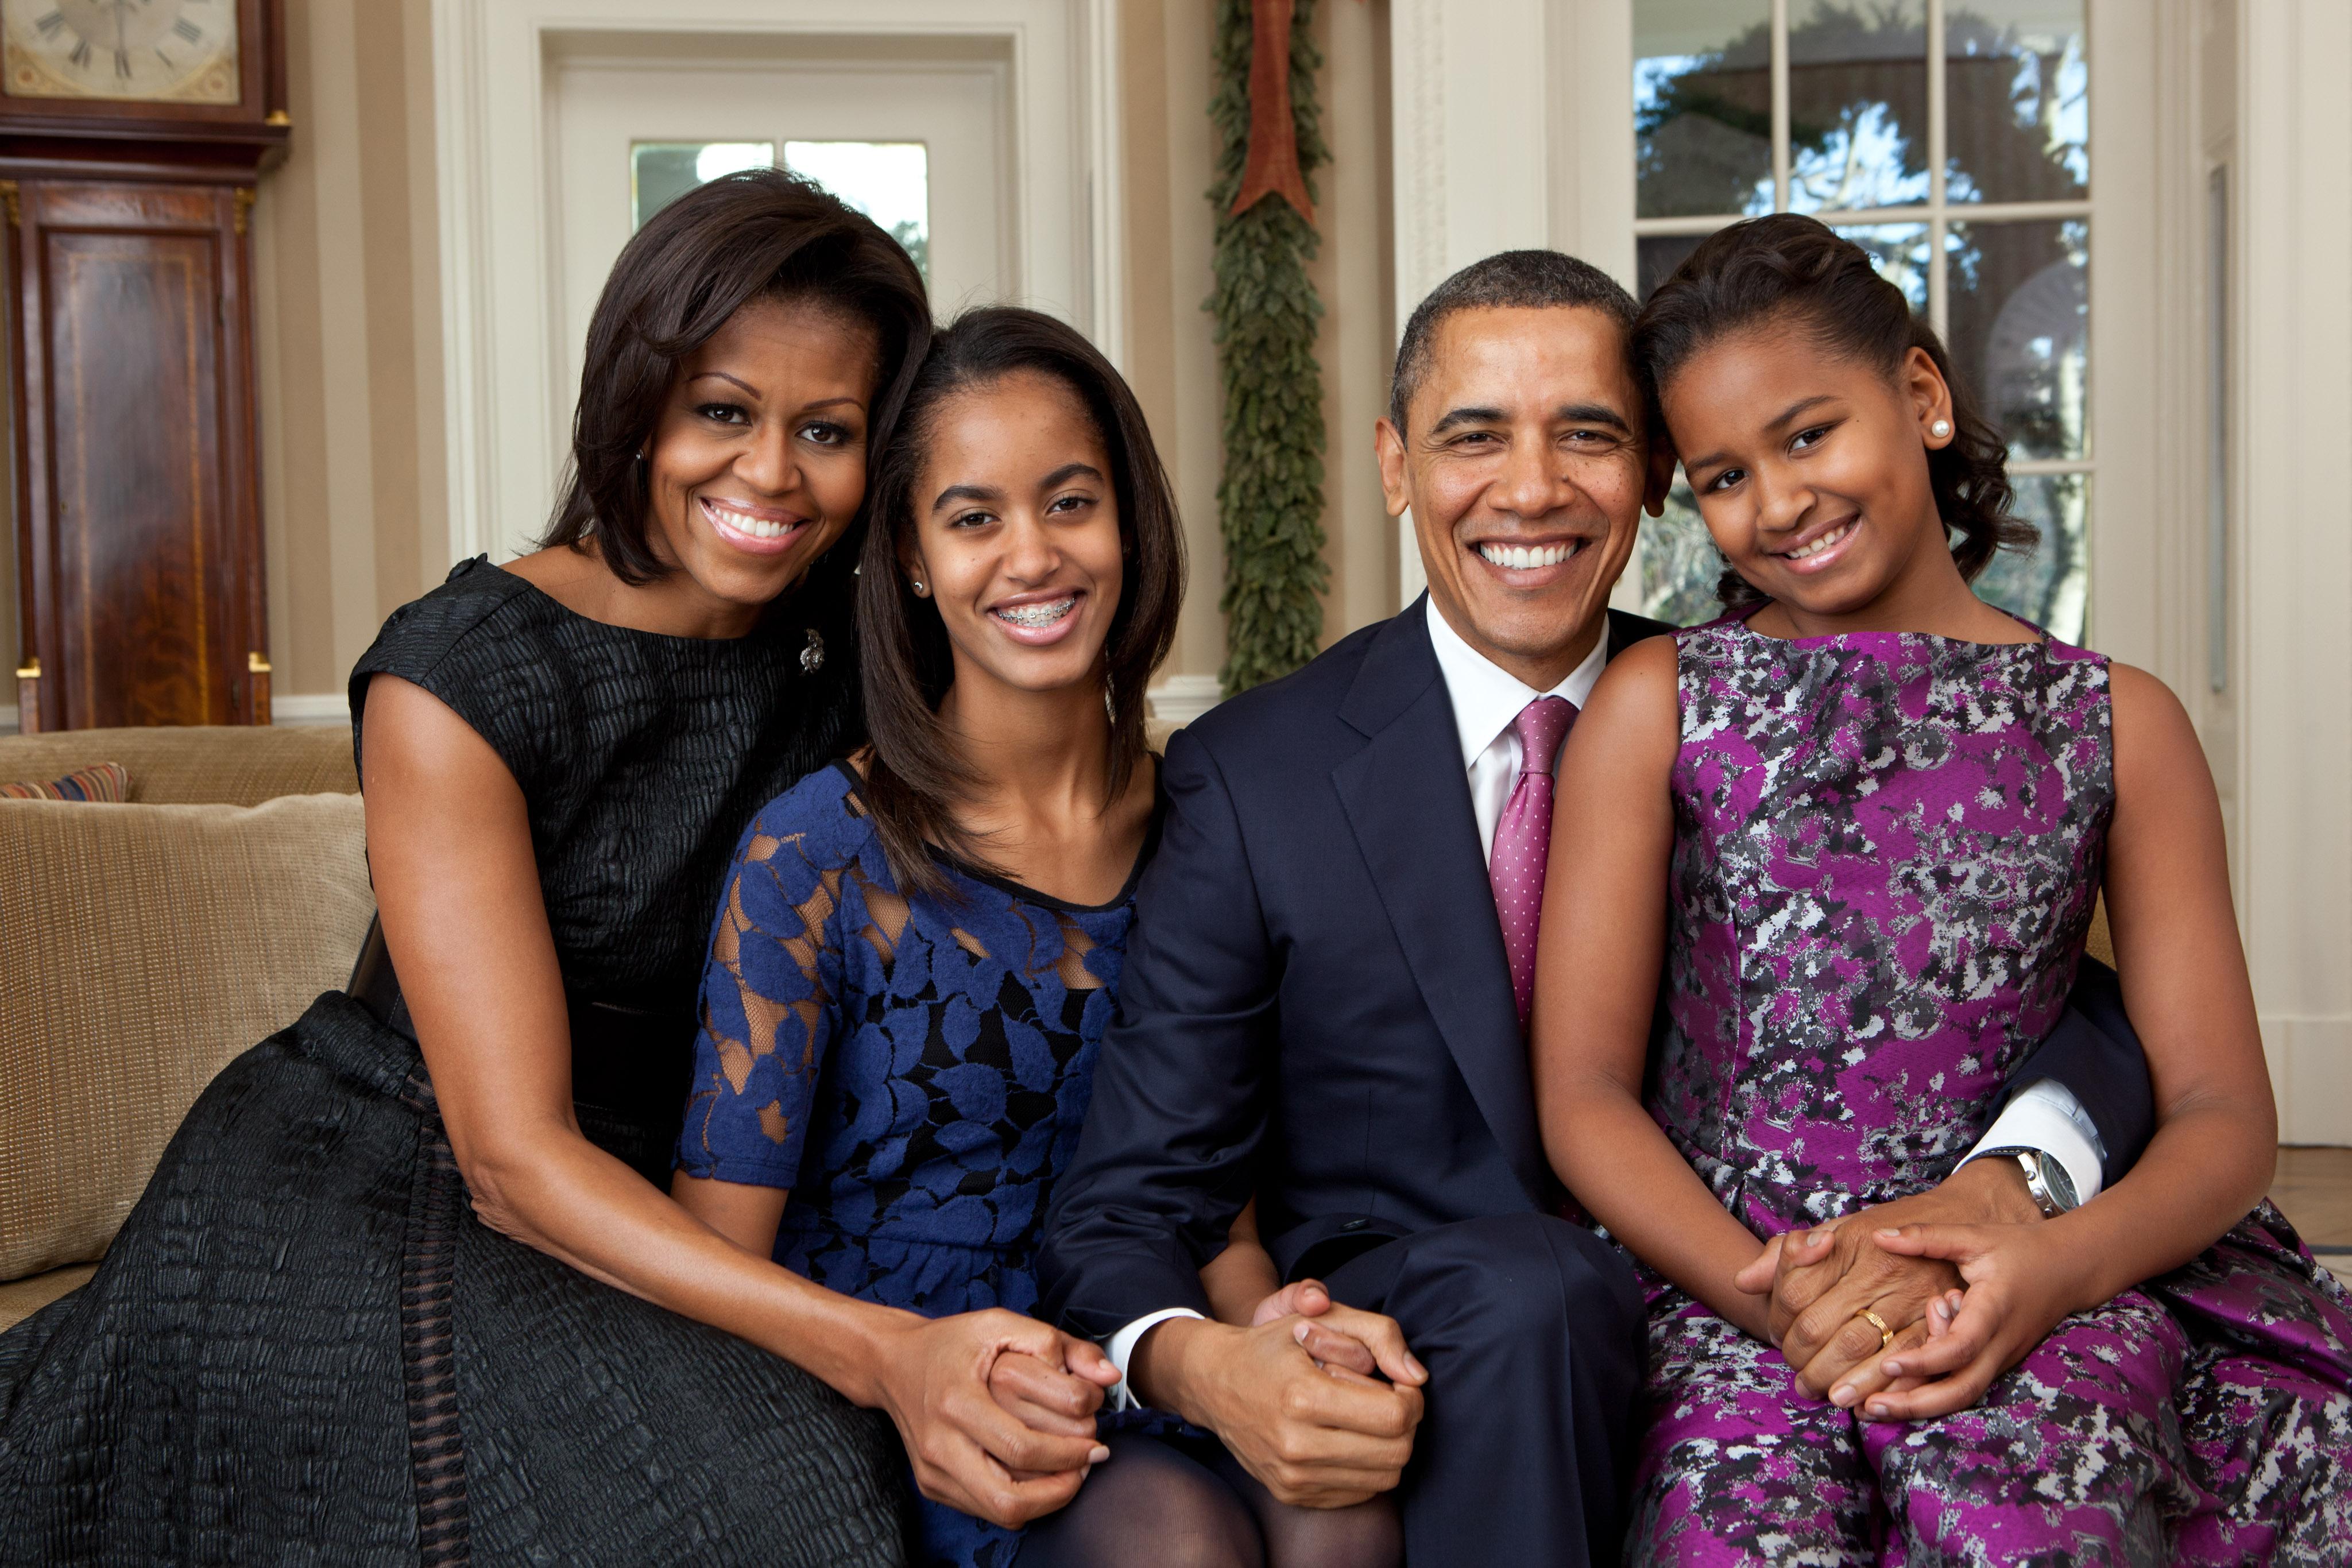 barack_obama_family_portrait_2011.jpg